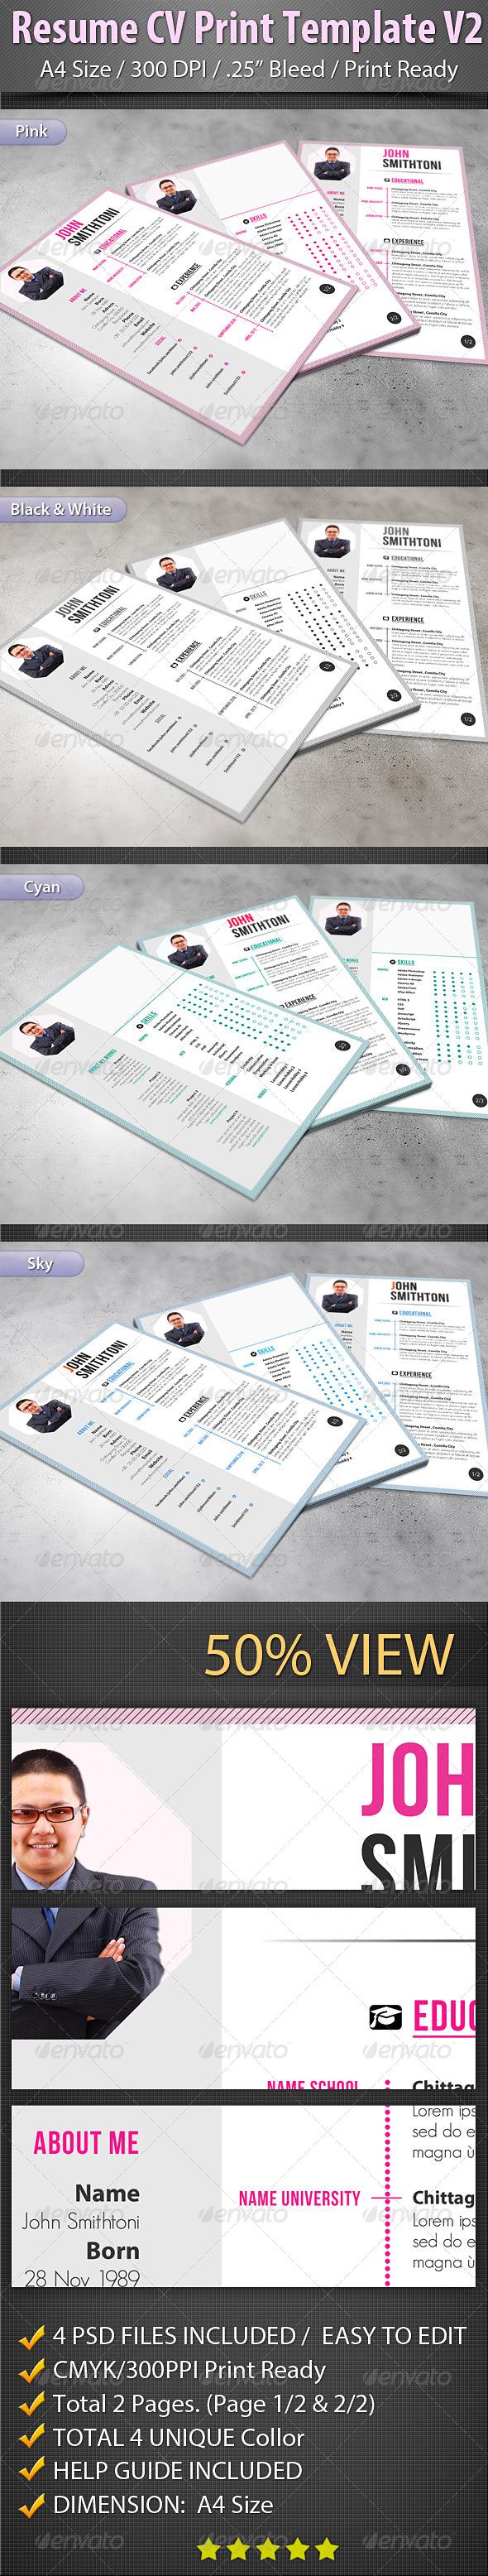 Resume CV Print Template V2